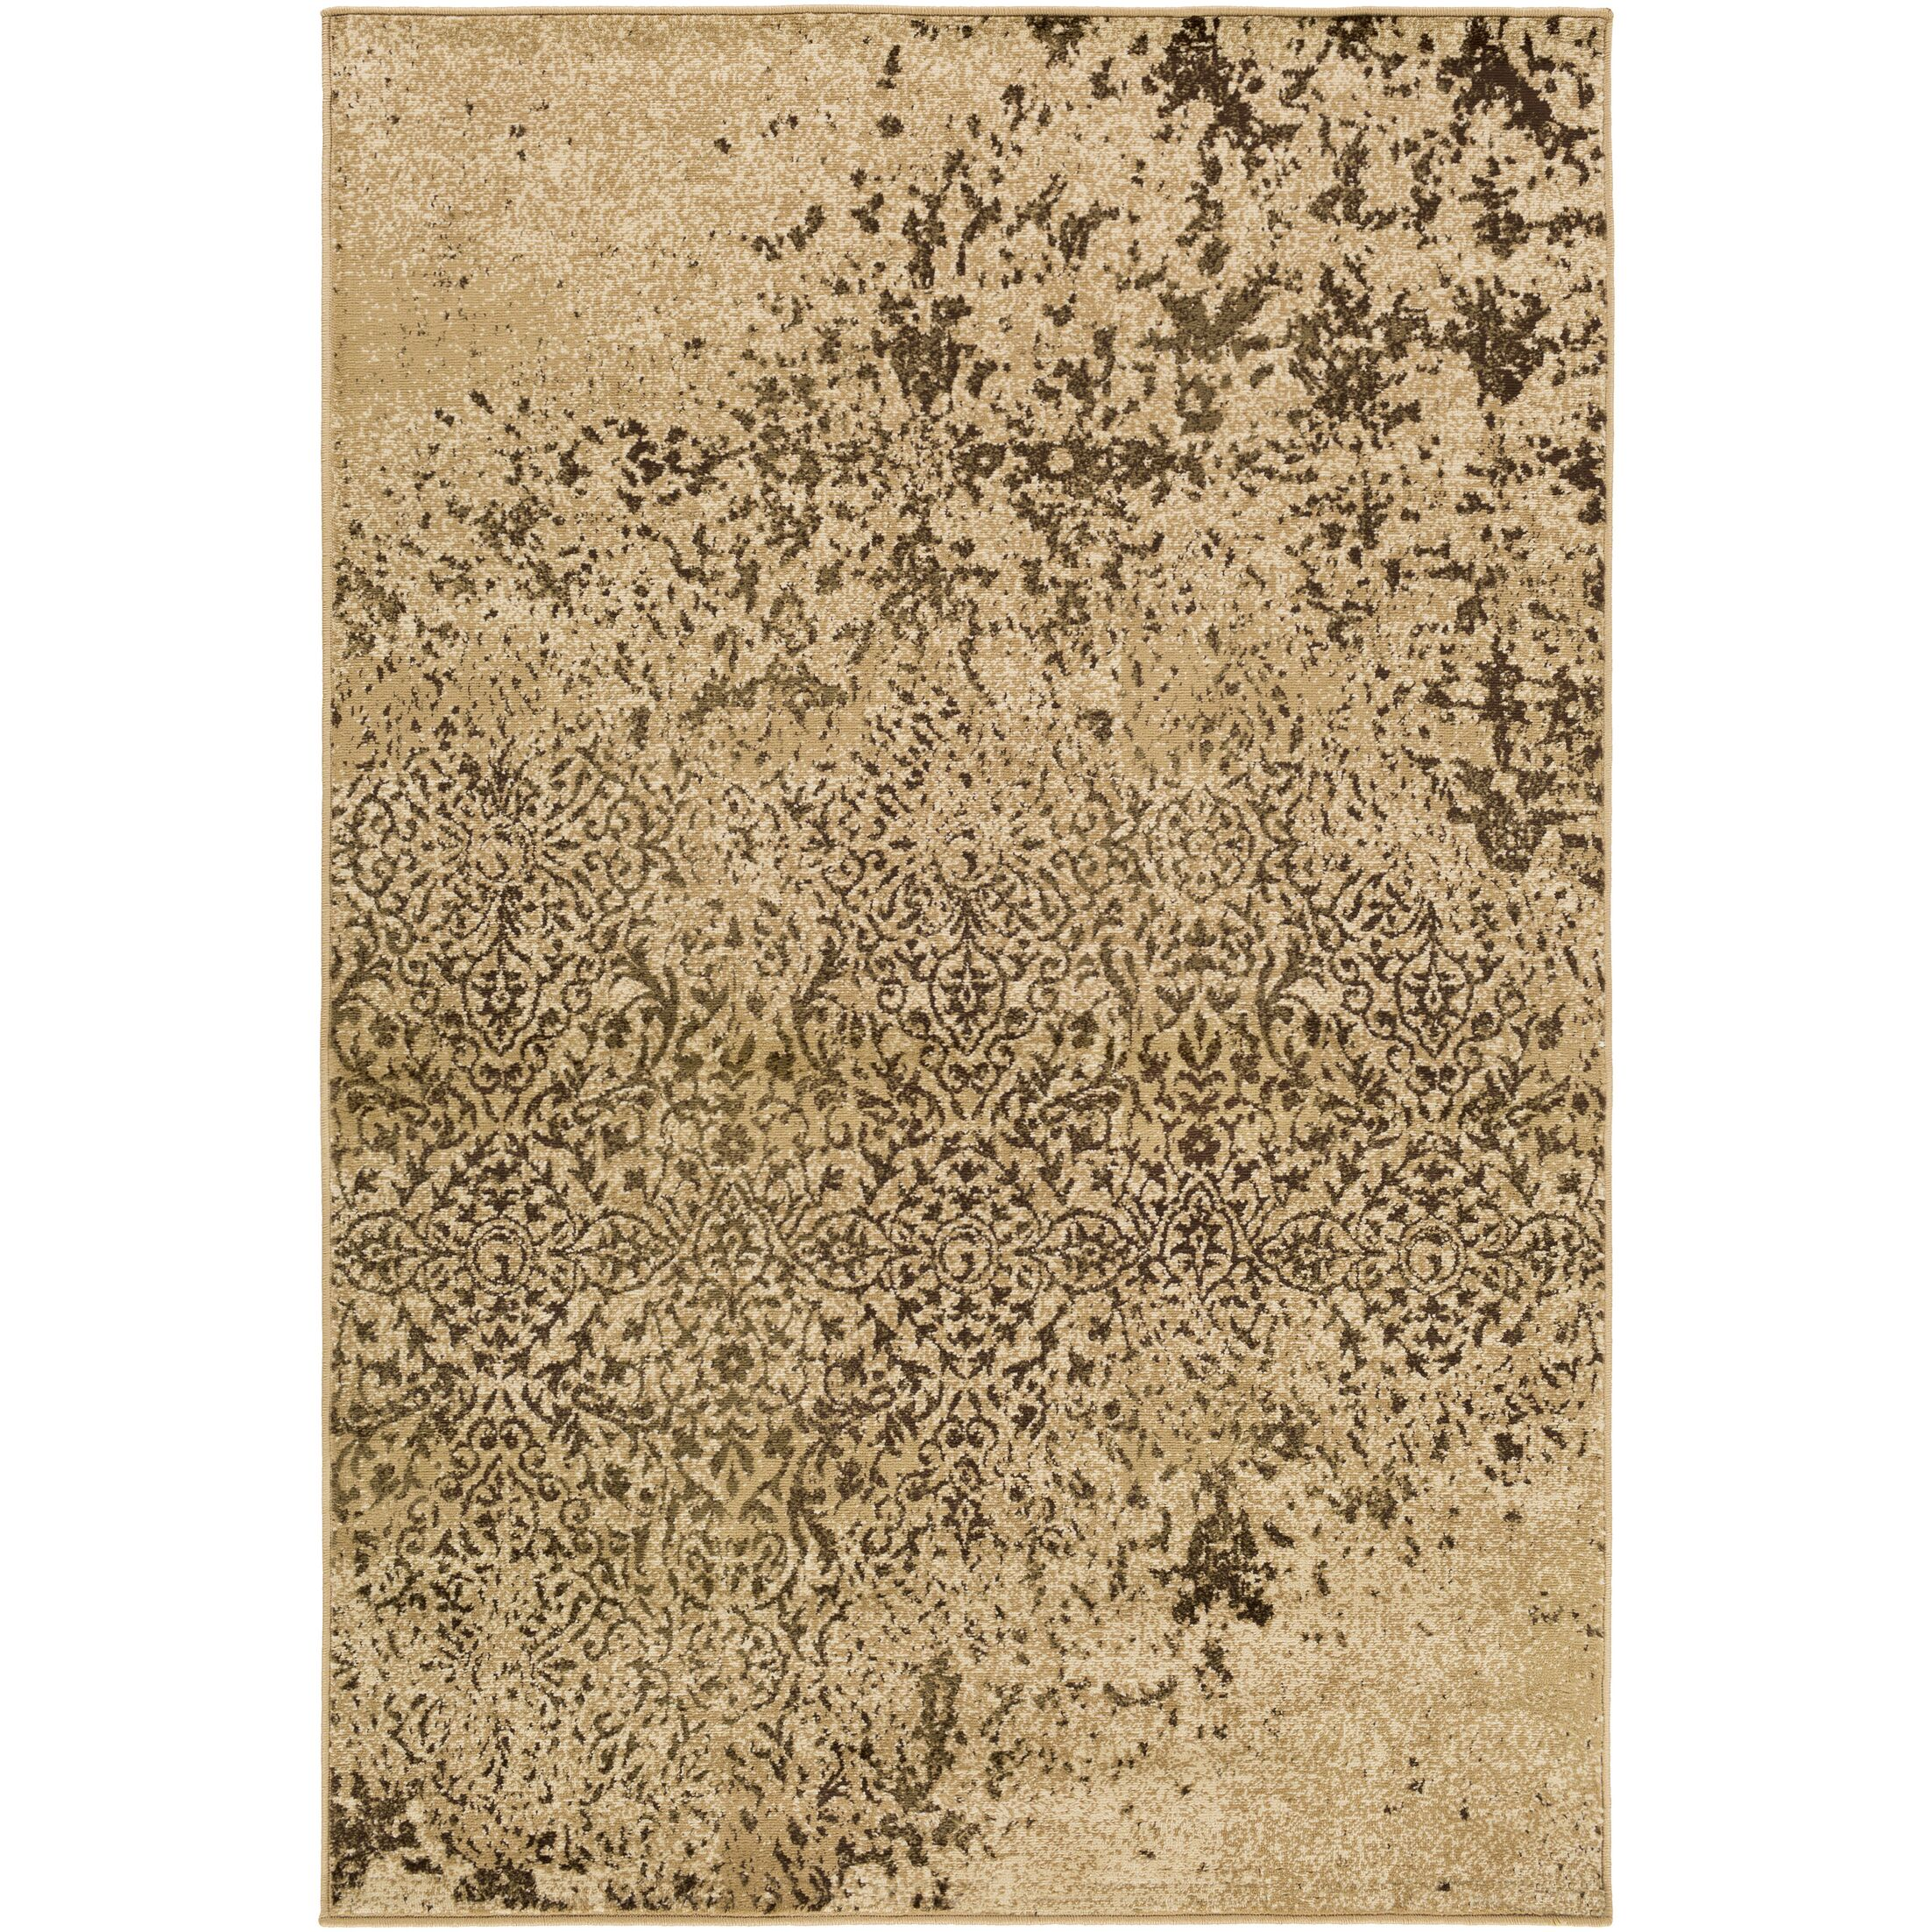 Kulpmont Abstract Tan Area Rug Rug Size: Rectangle 7'9